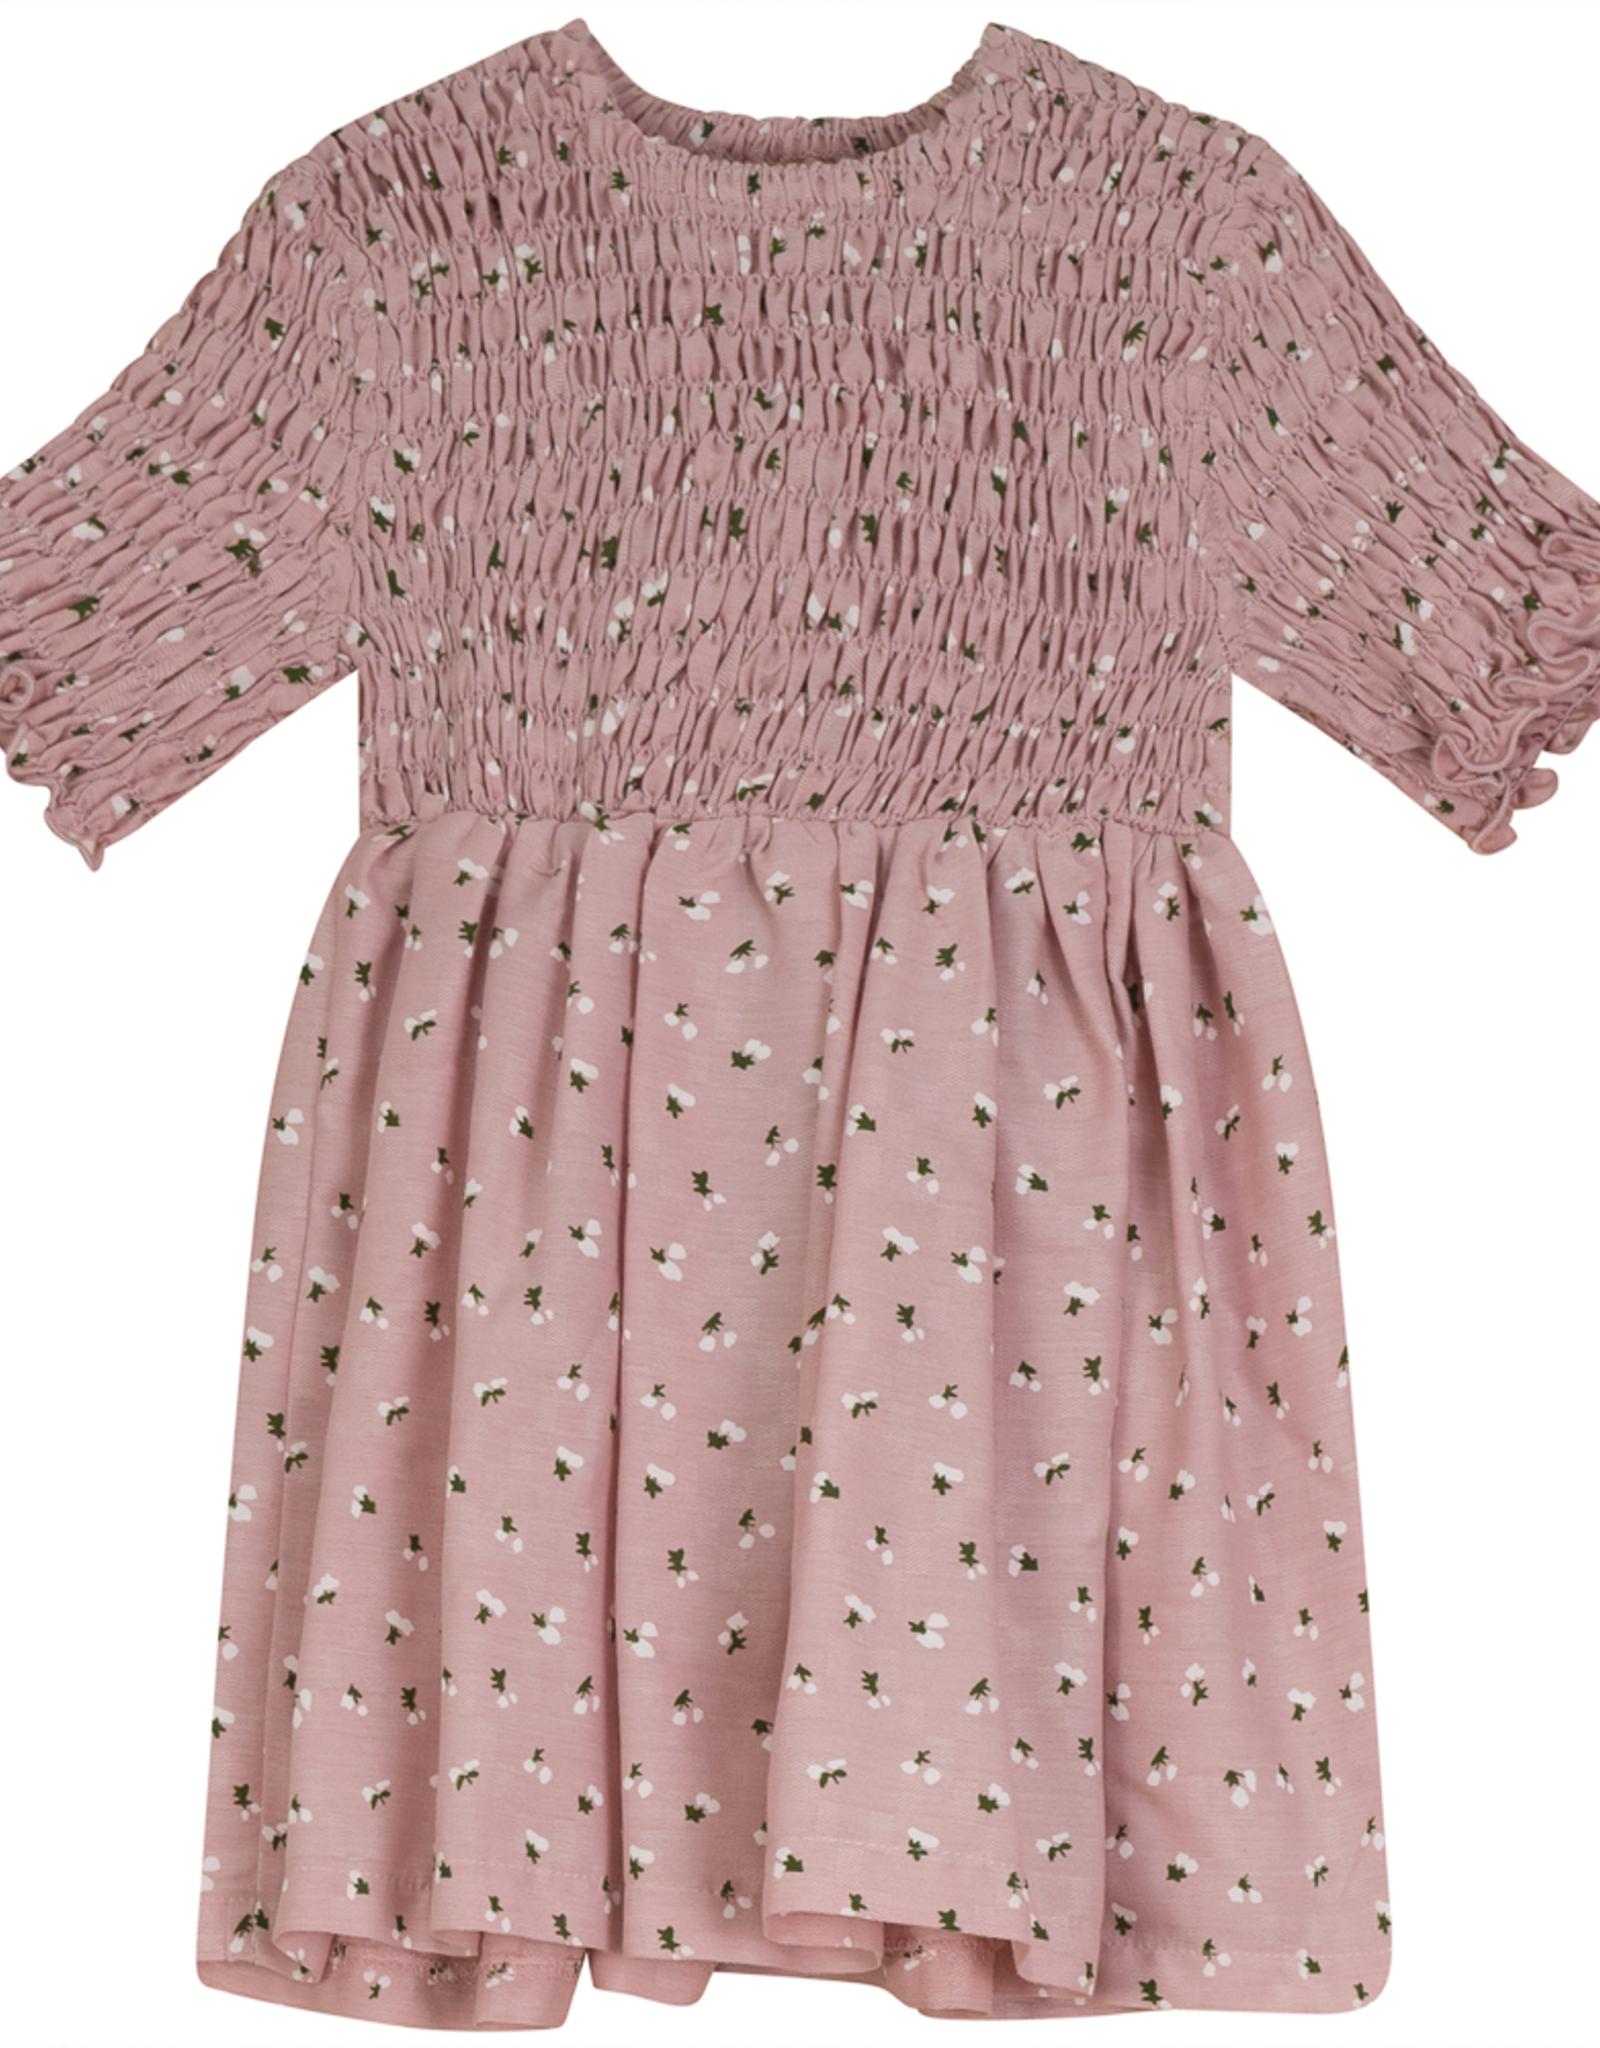 Clo Clo Tulip Print Dress with Smocked Top